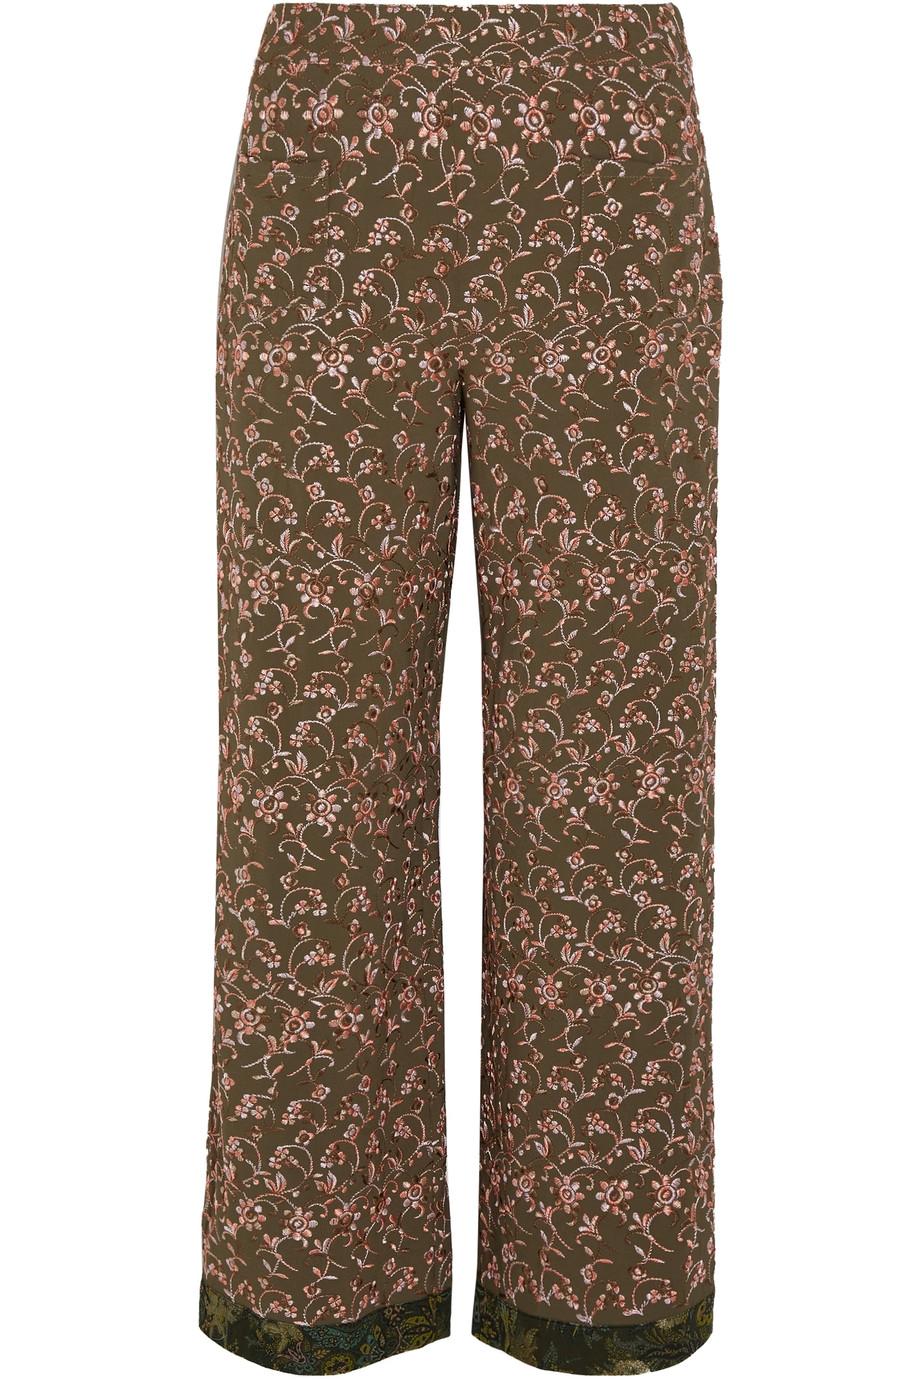 Etro Silks Embroidered crepe wide-leg pants